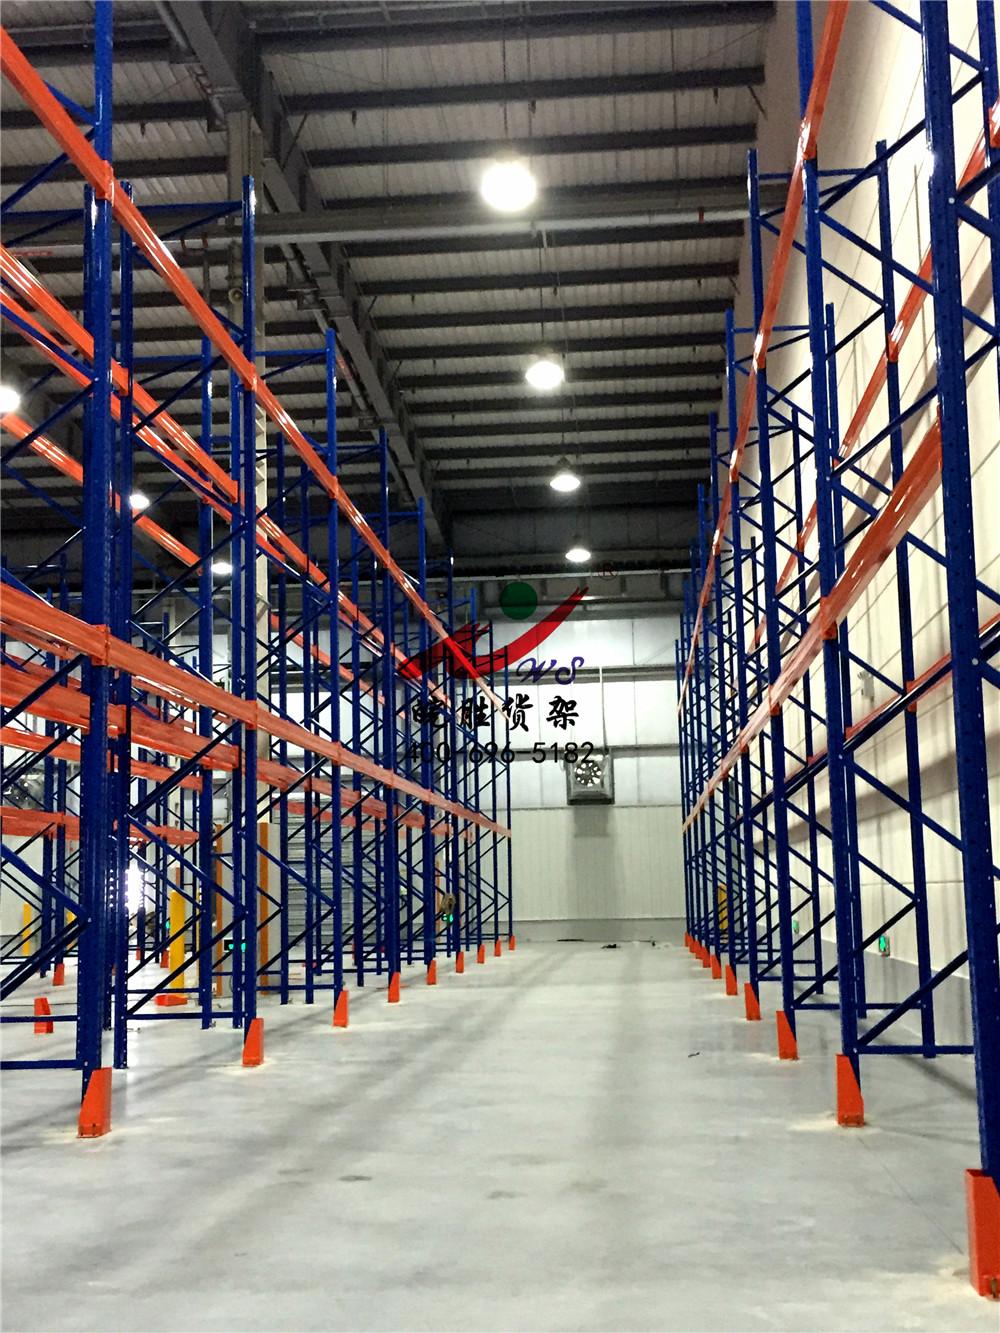 XX物流(上海)有限公司 重型货架